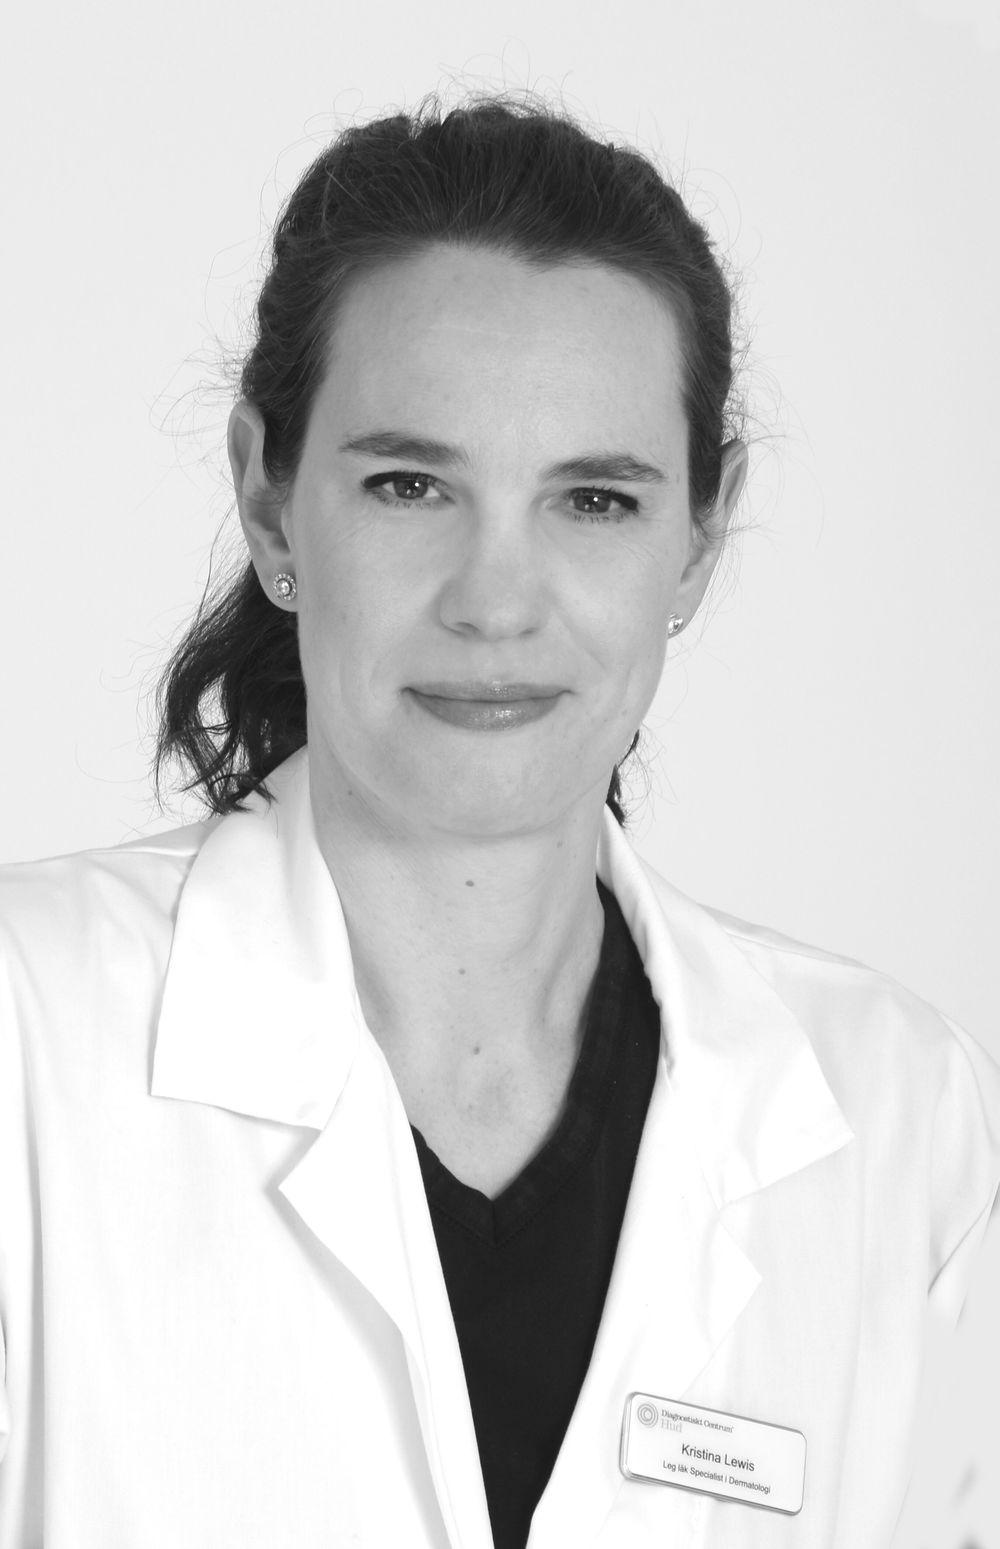 Kristina Lewis